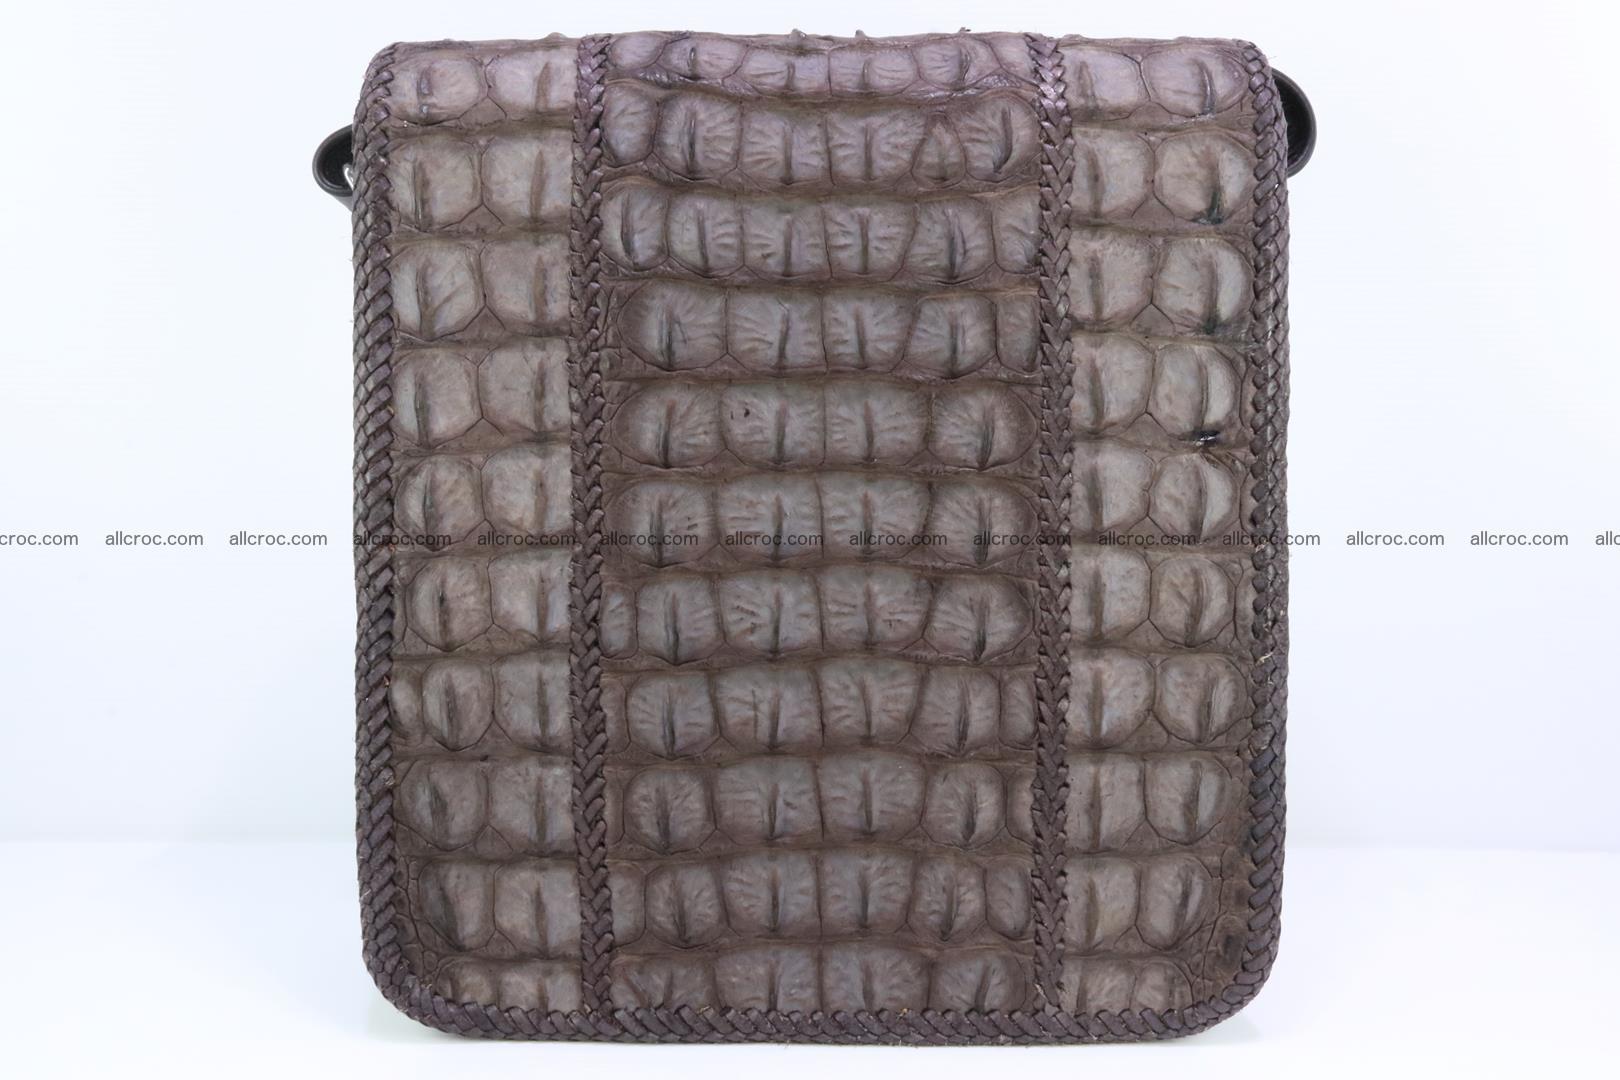 Сrocodile skin shoulder bag with braided edges 142 Foto 3